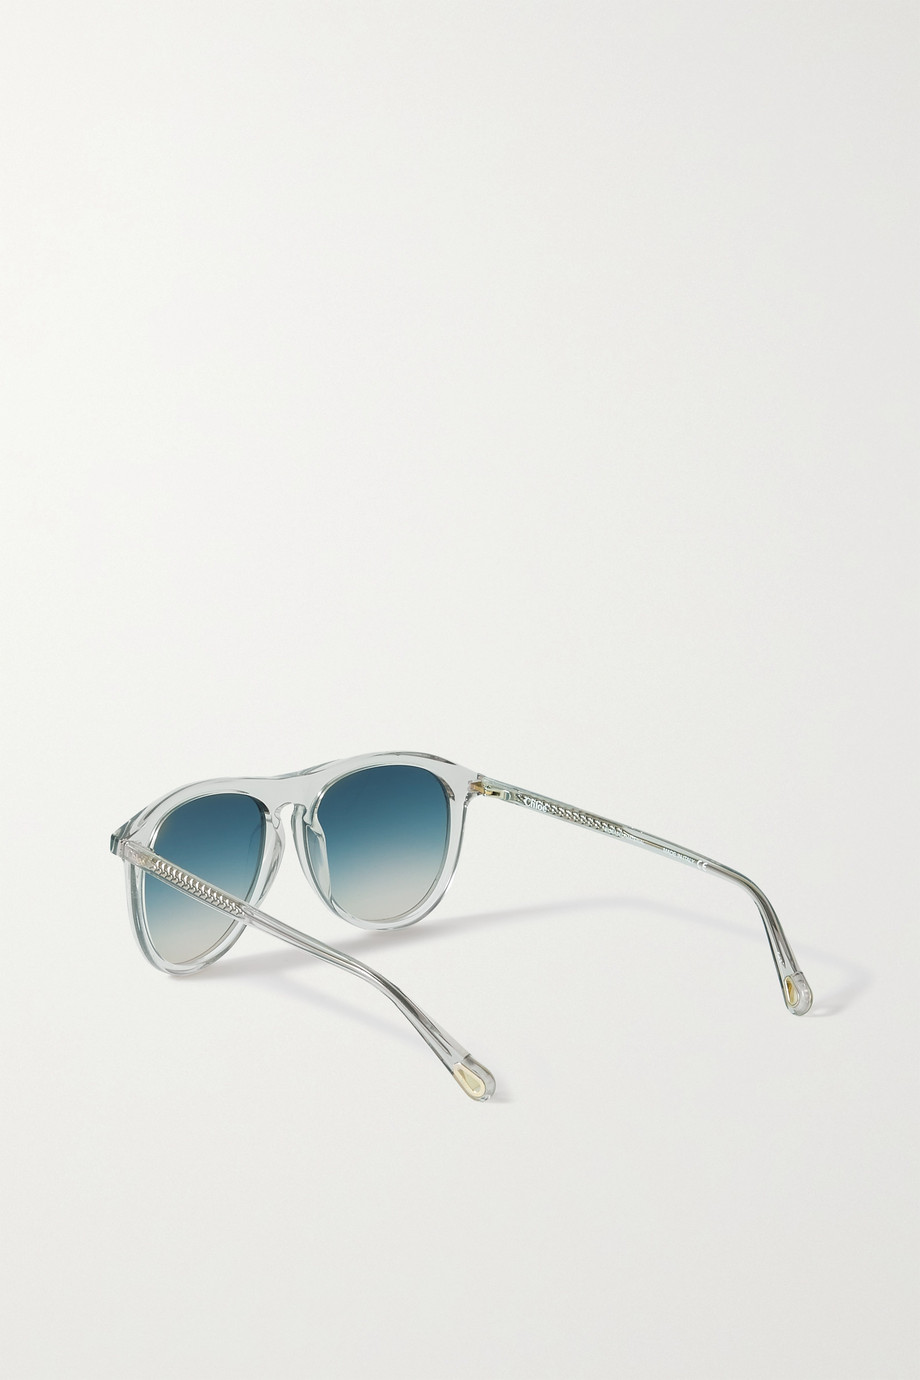 Chloé Wayfarer Sonnenbrille mit rundem Rahmen aus Azetat